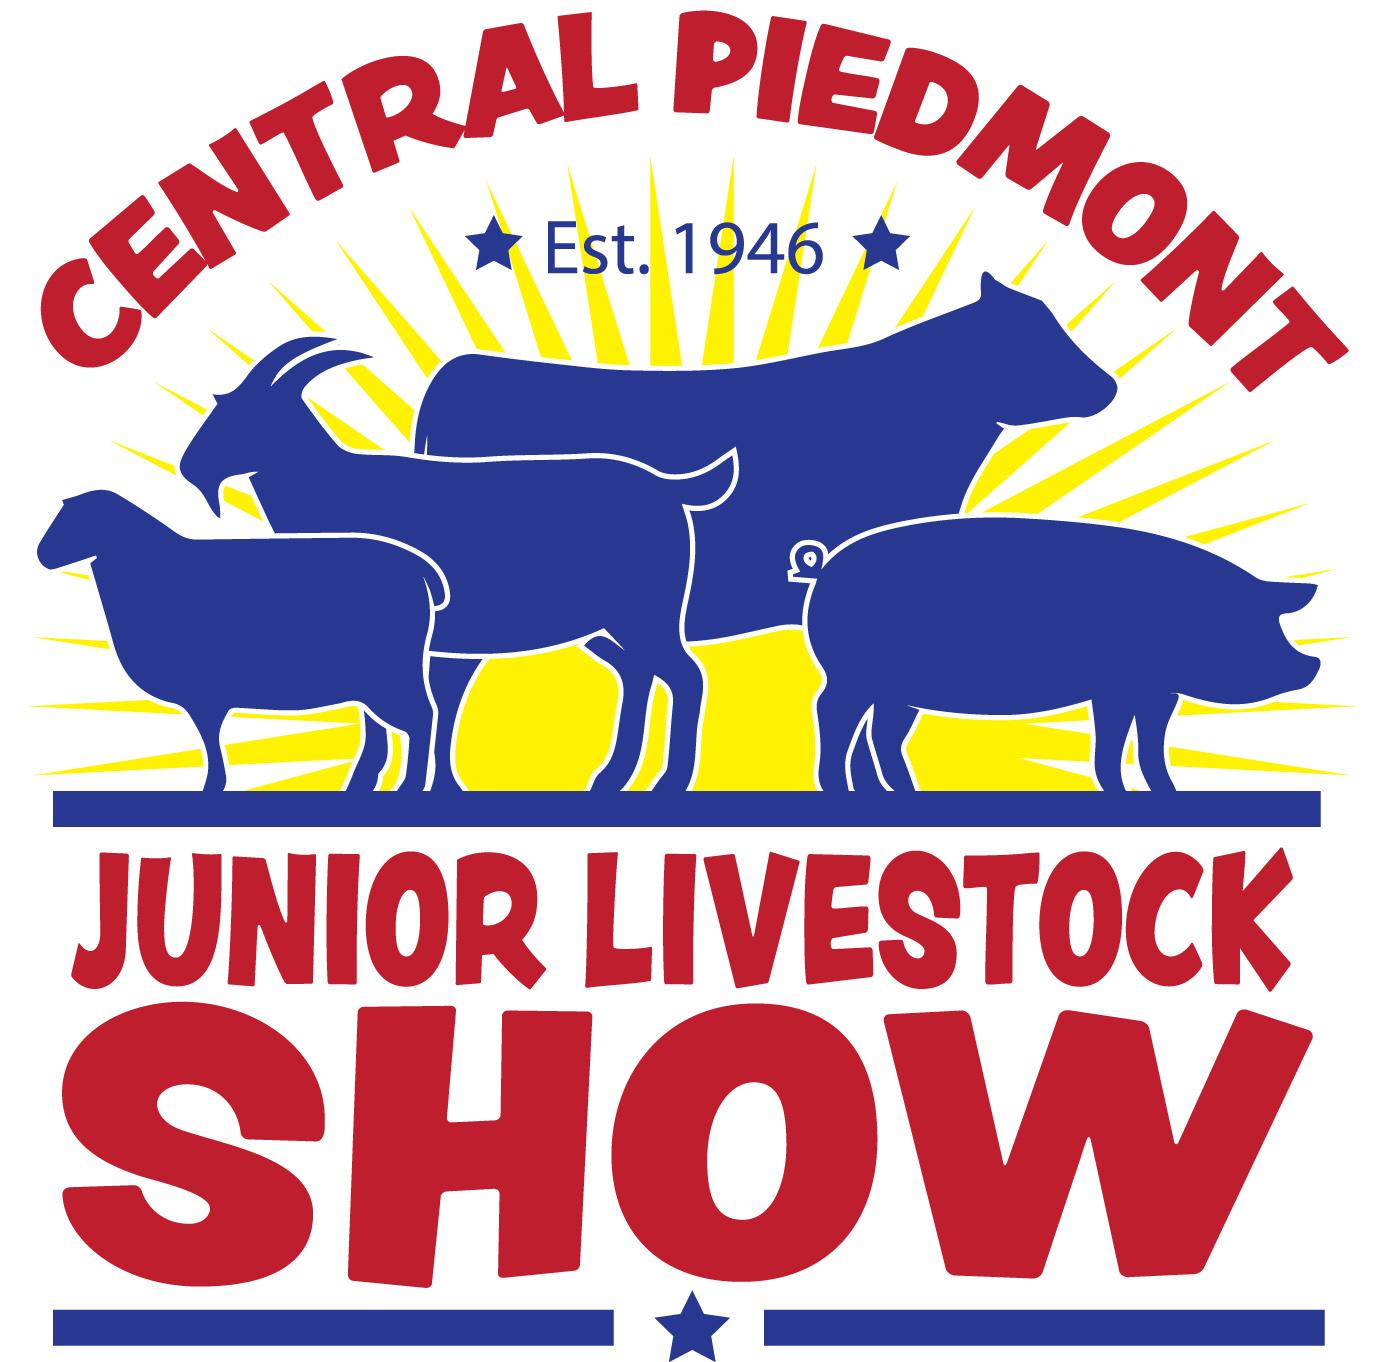 Livestock Show banner image